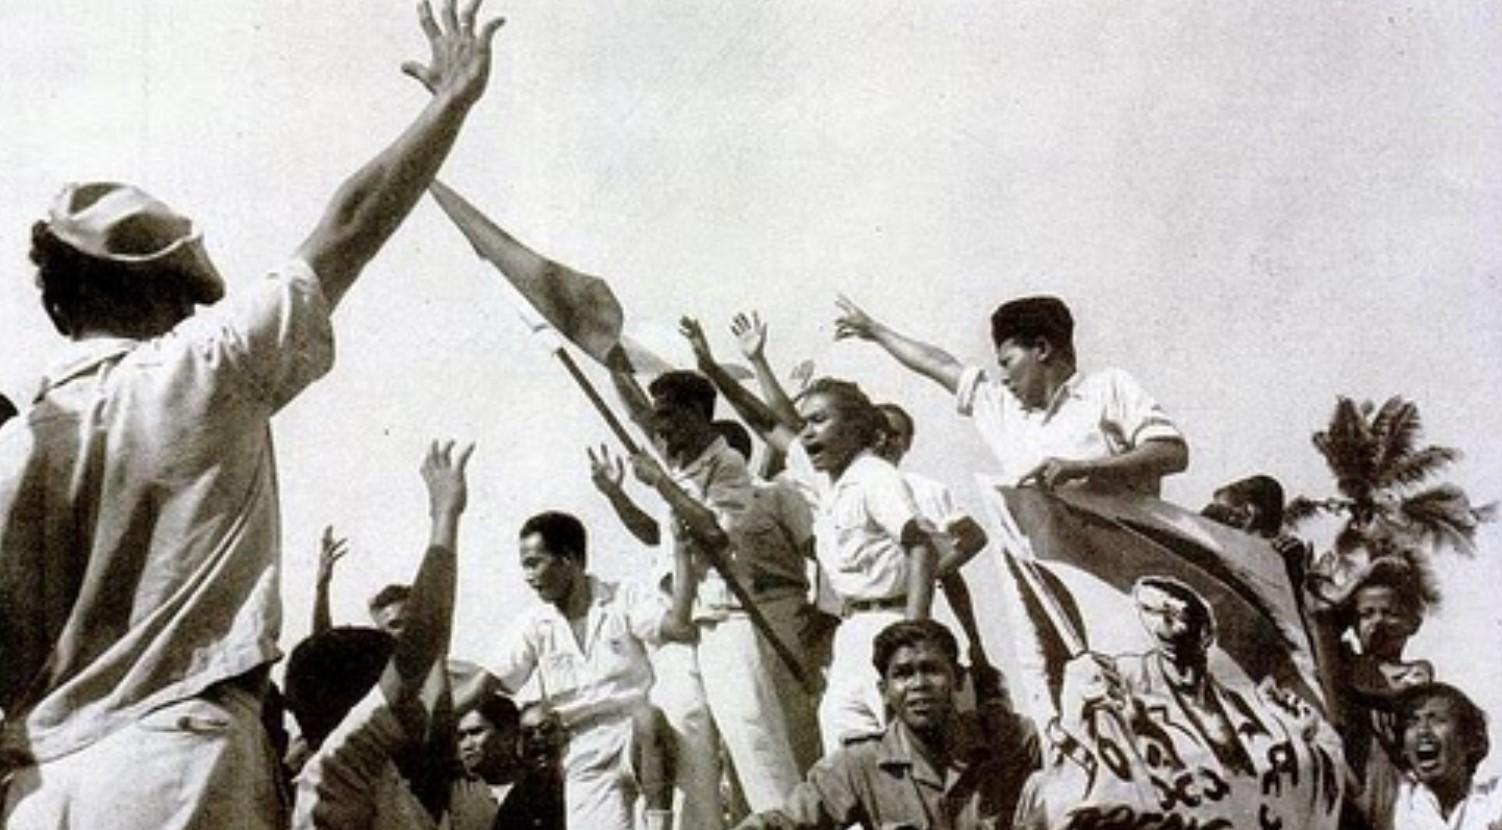 Gambar Thumbnail Perjuangan Mempertahankan Kemerdekaan Indonesia